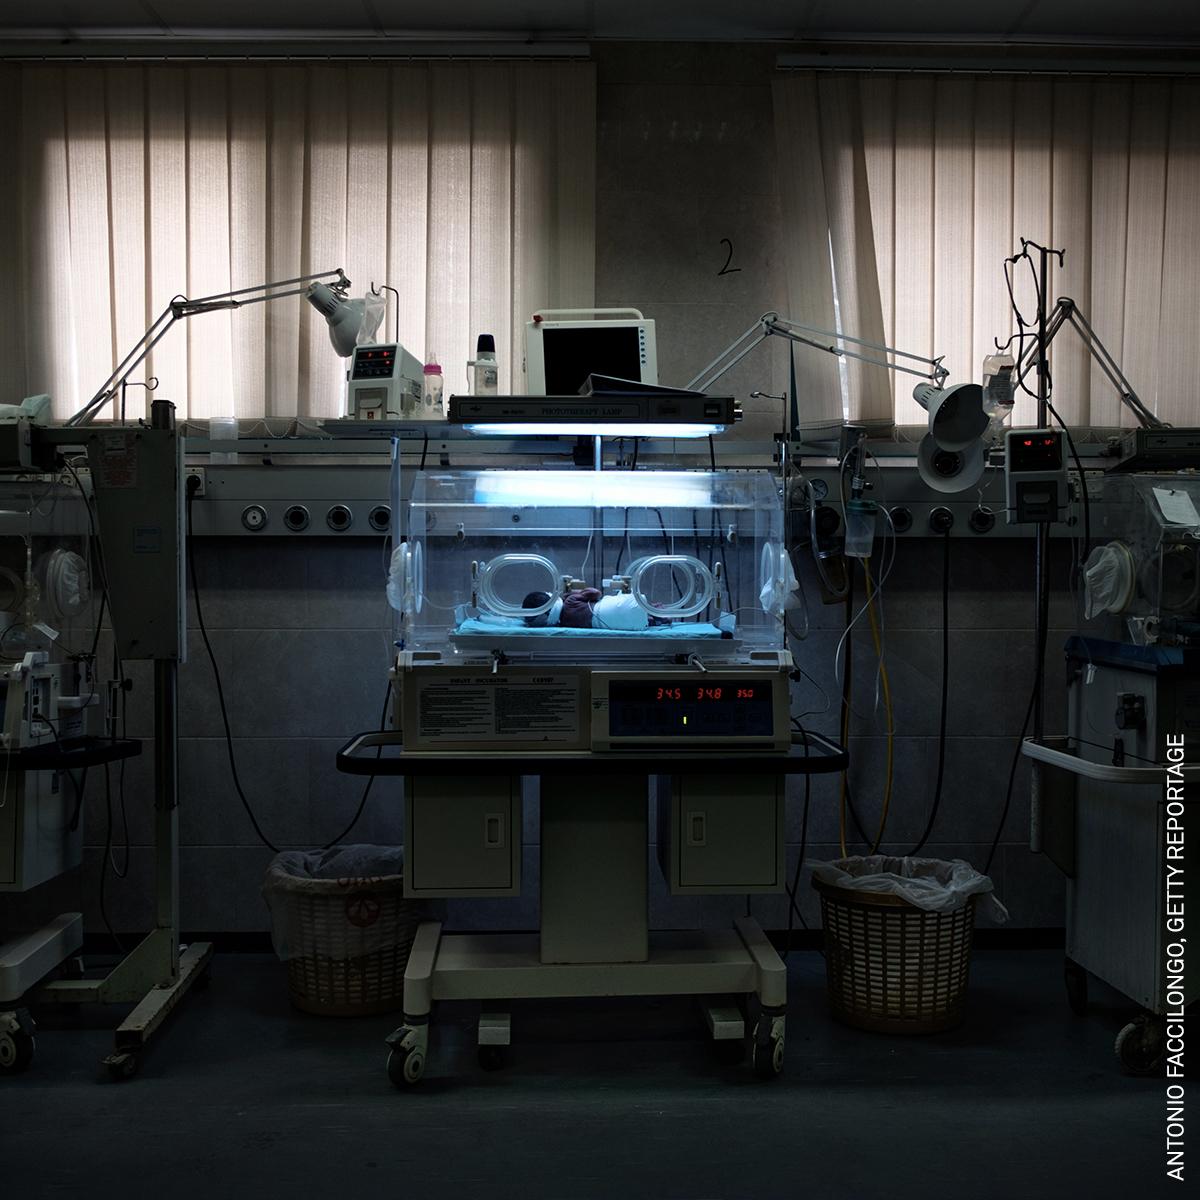 014_World Press Photo Story of the Year Nominee_Online_Antonio Faccilongo_Getty Reportage